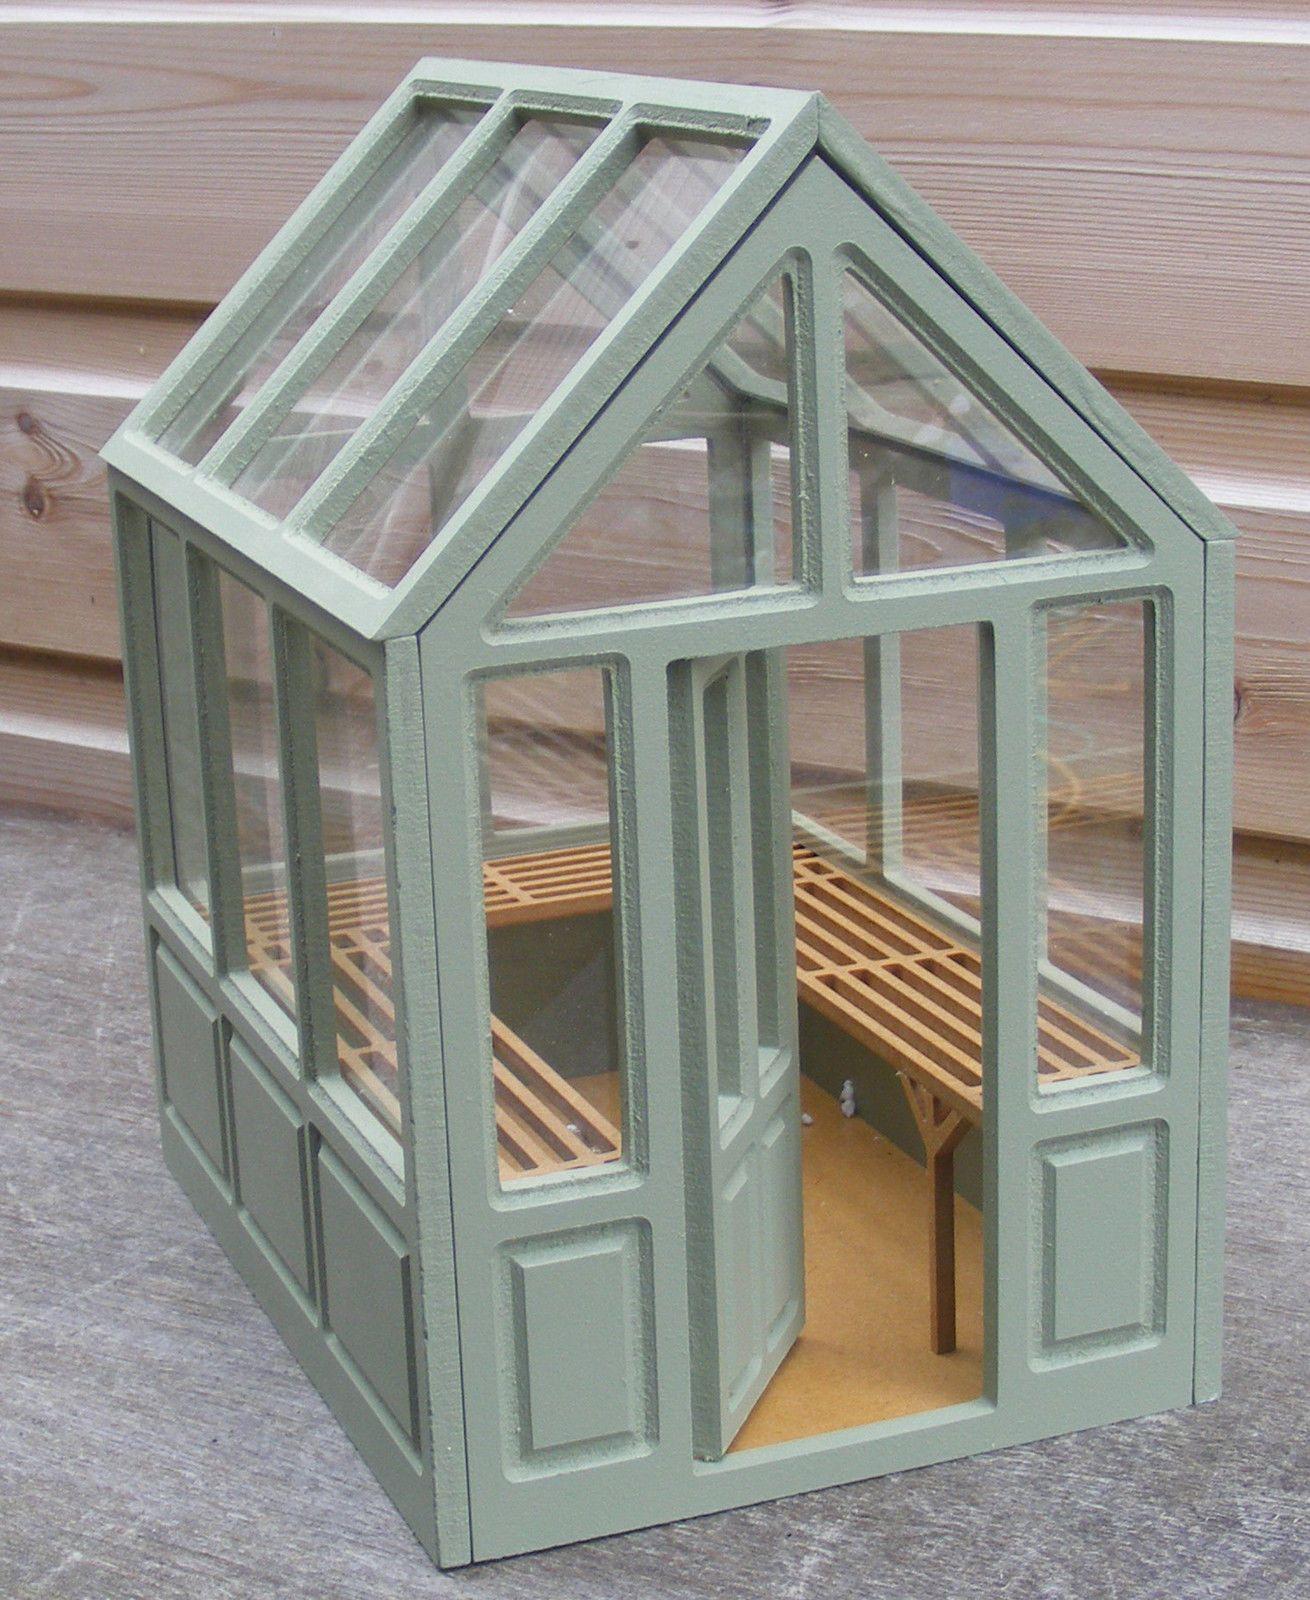 1 12 scale dolls house miniature